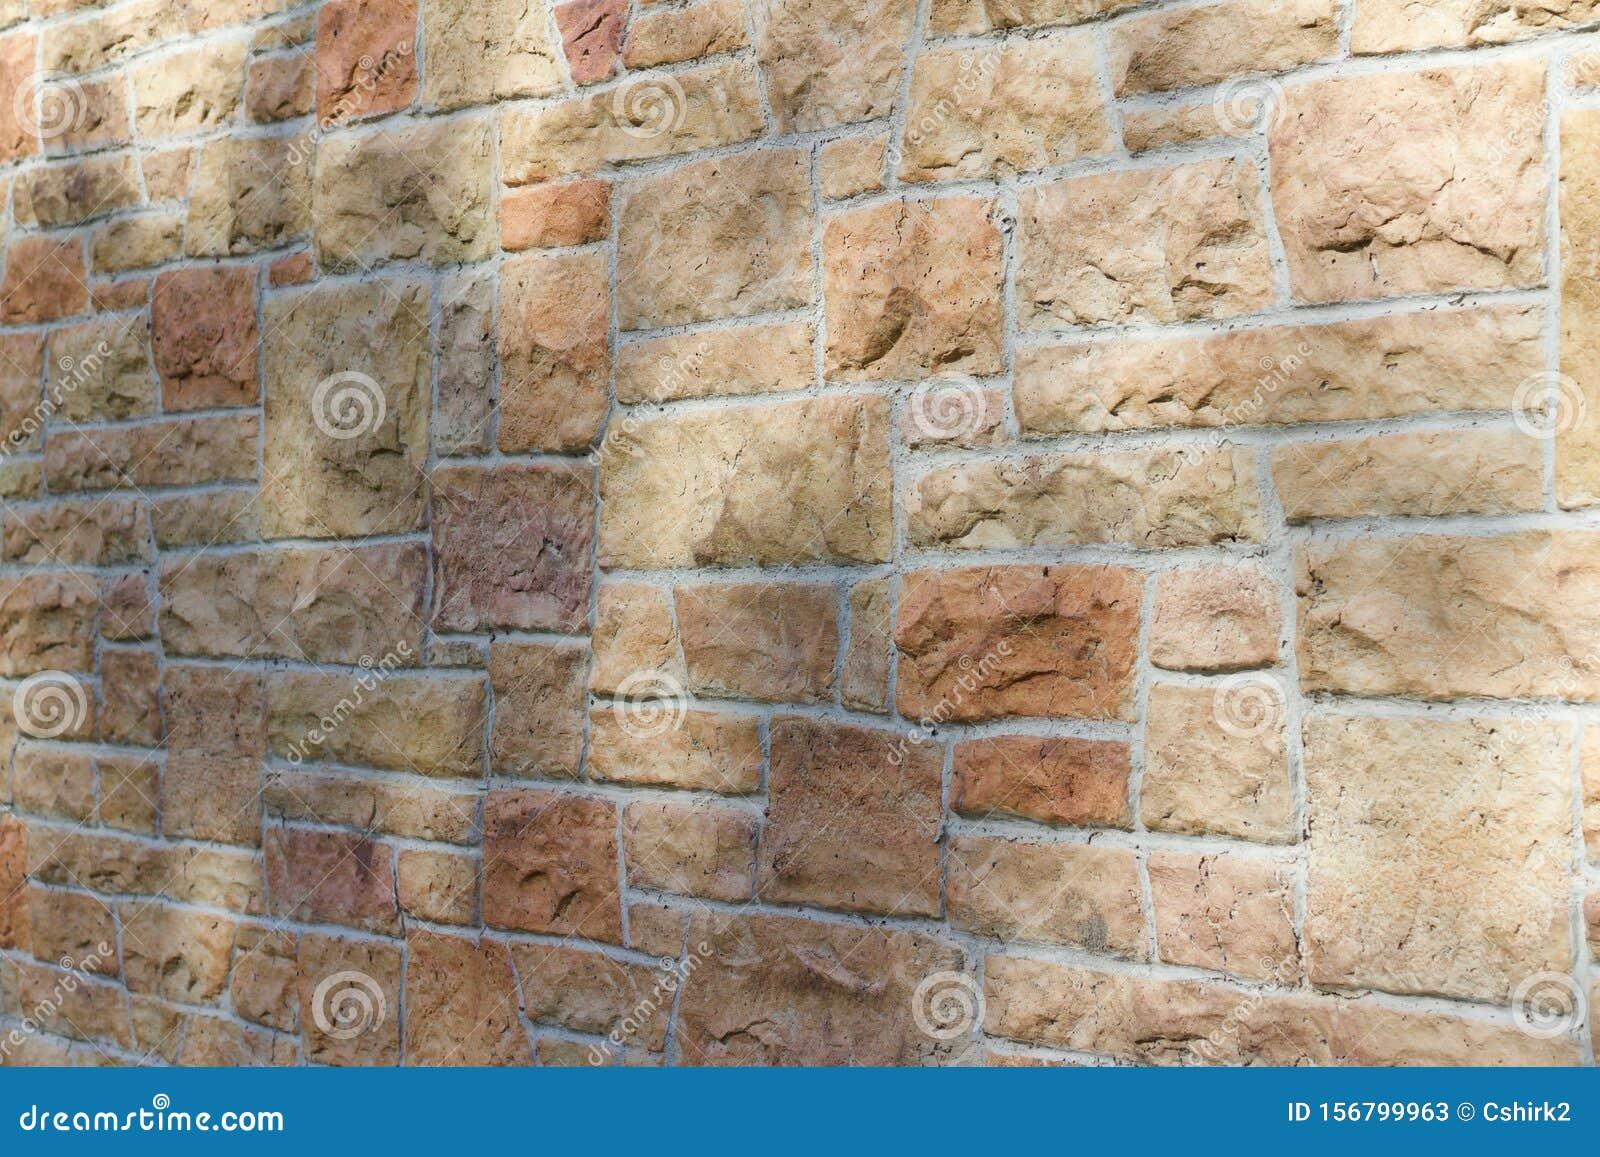 Vintage kasota limestone brick wall texture in colors of orange and pink beige